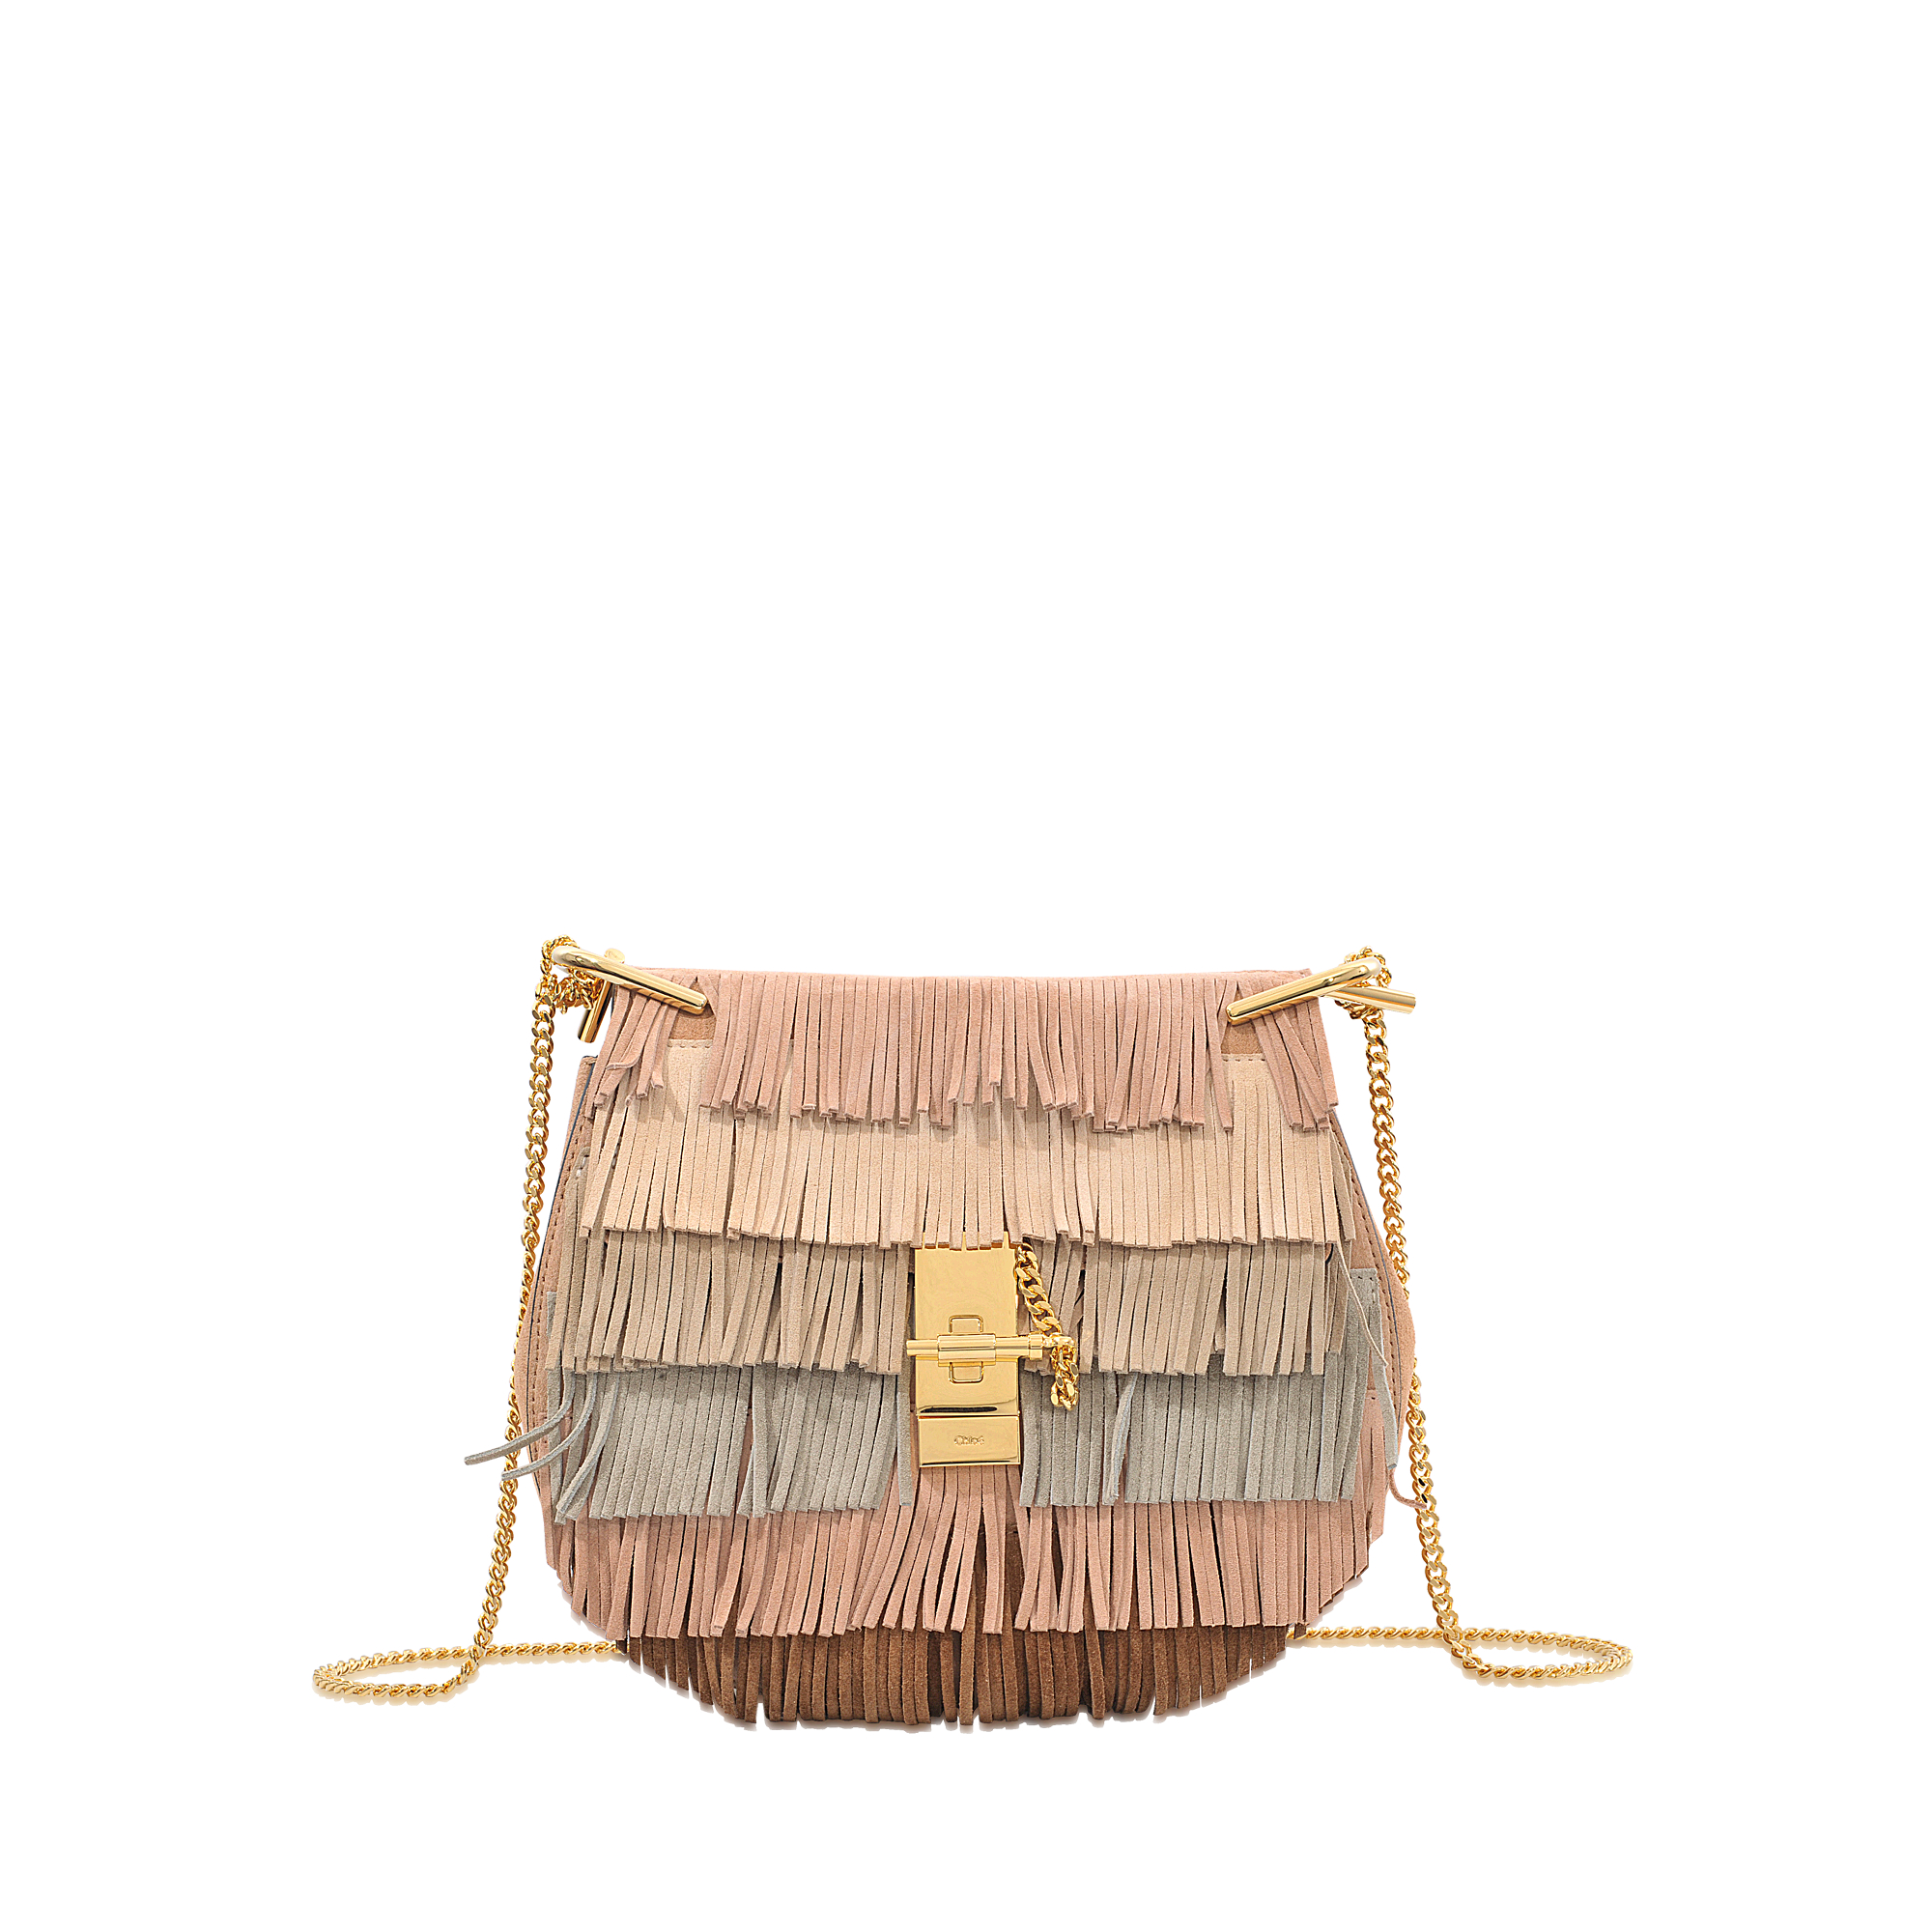 chloe drew small shoulder bag